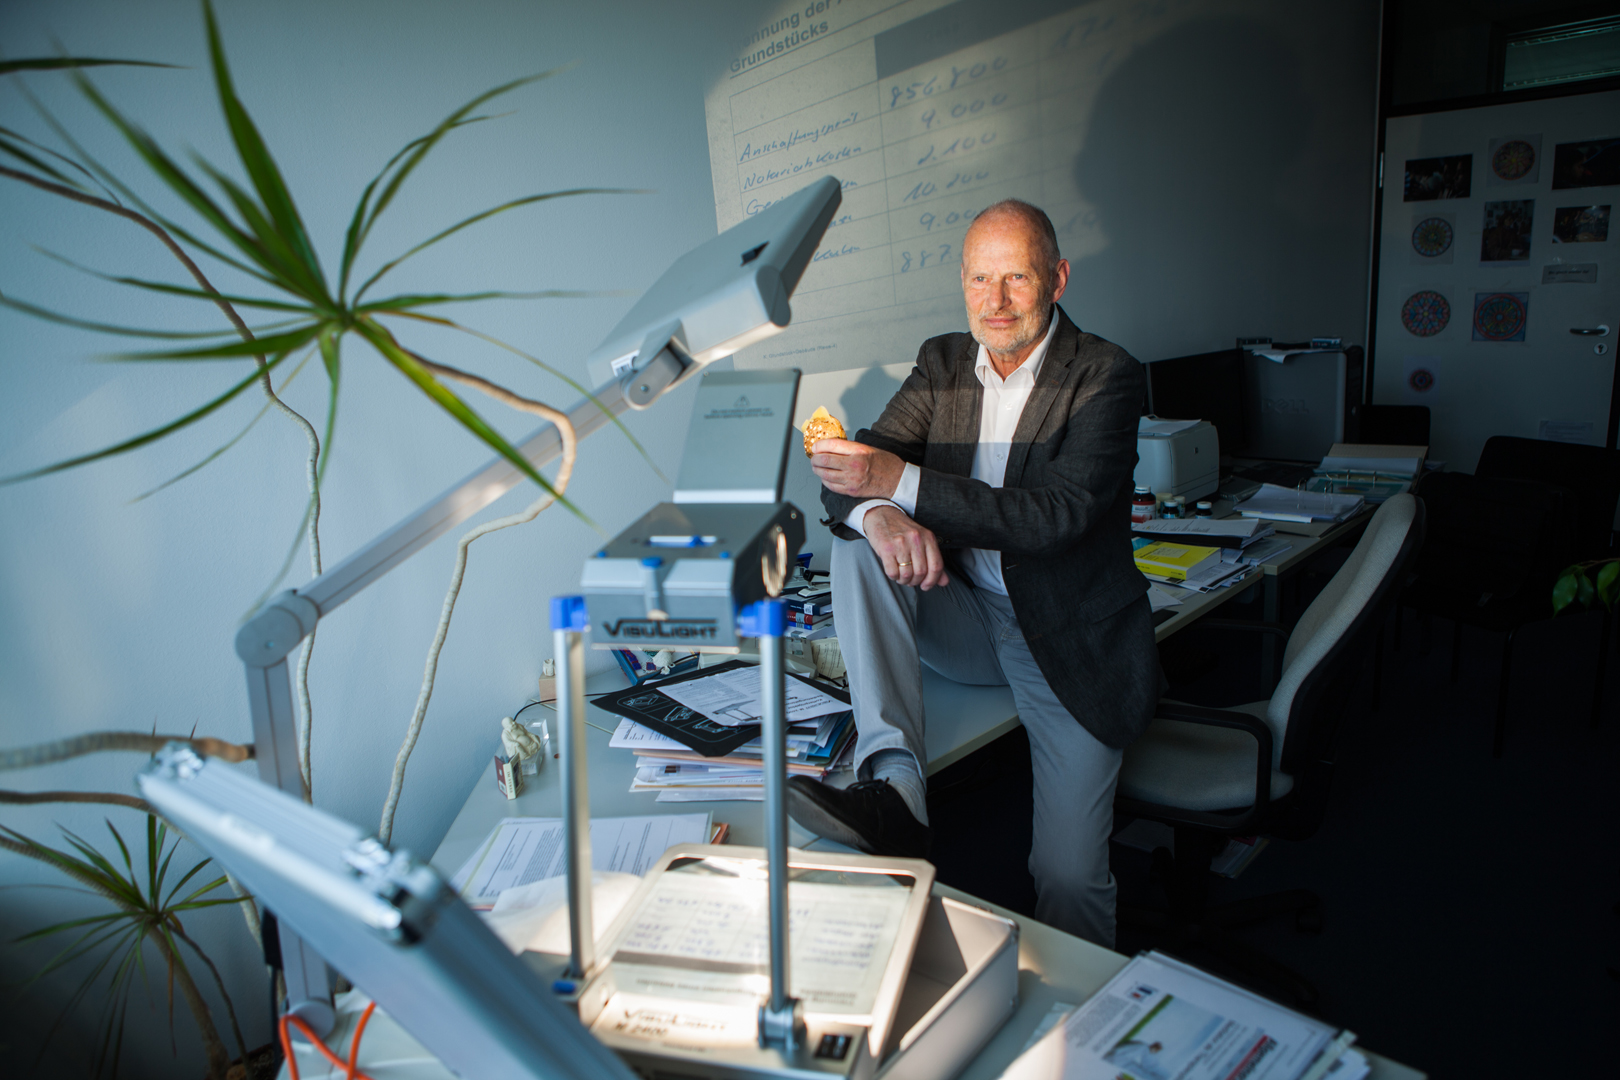 Prof. Dr. rer. pol. Klaus Kairies, Hochschule Hannover